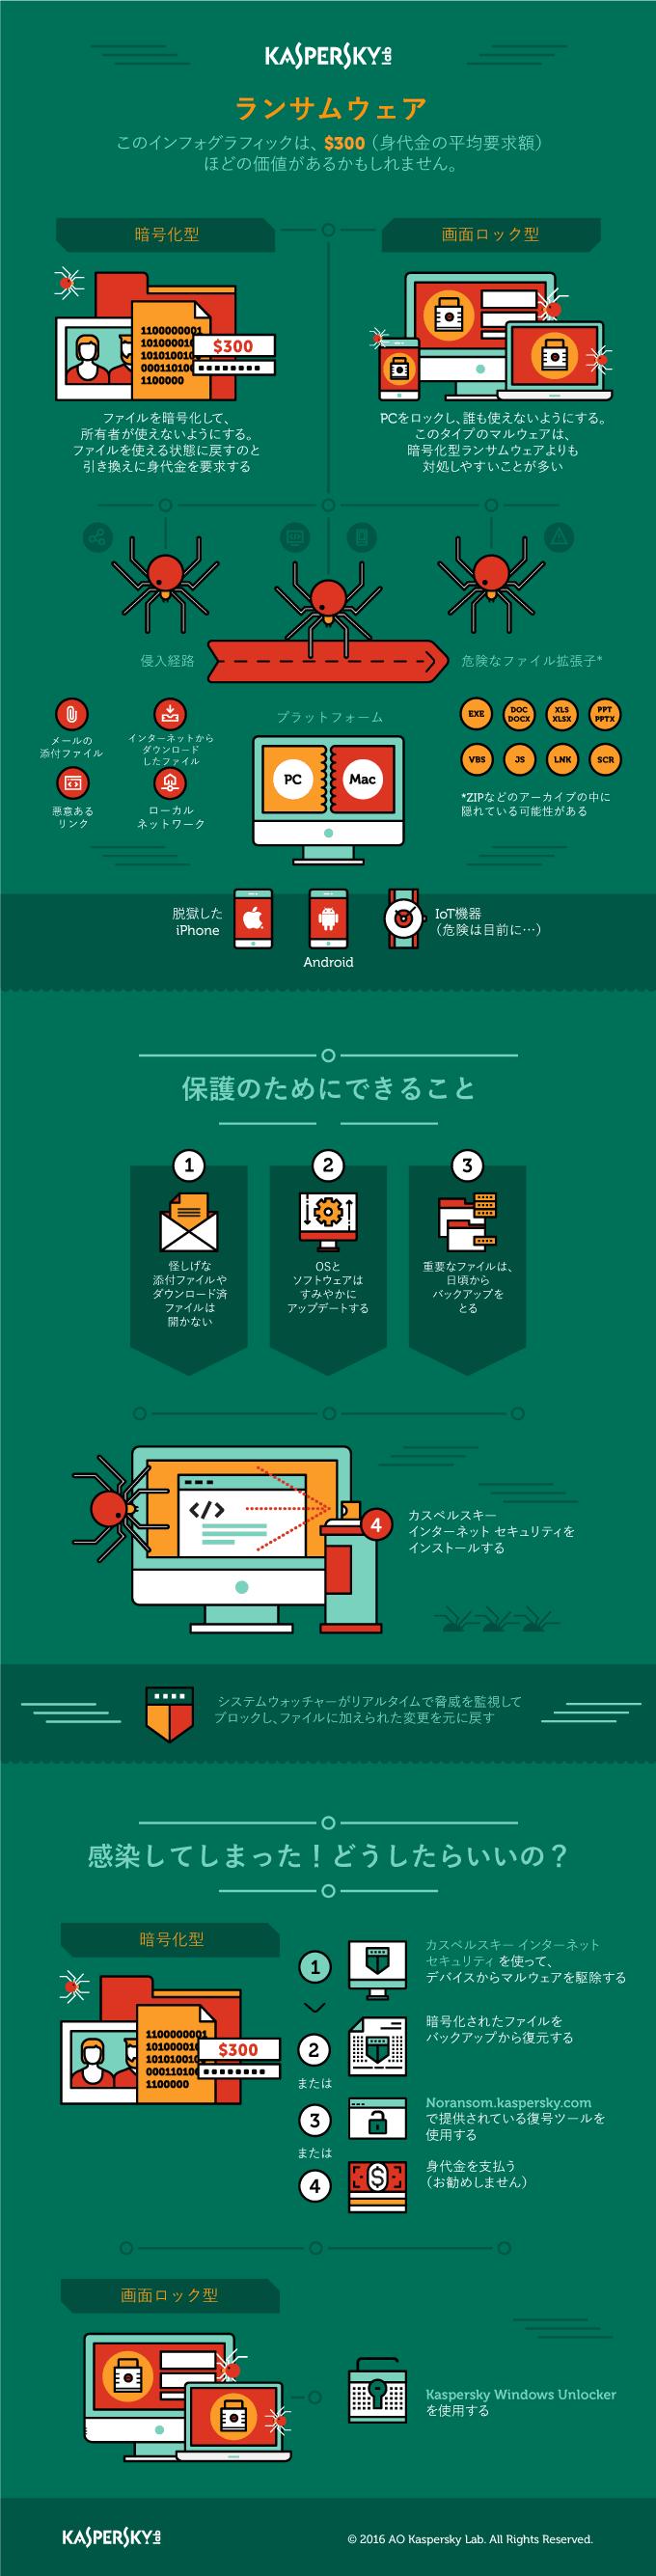 ransomware_2_ja